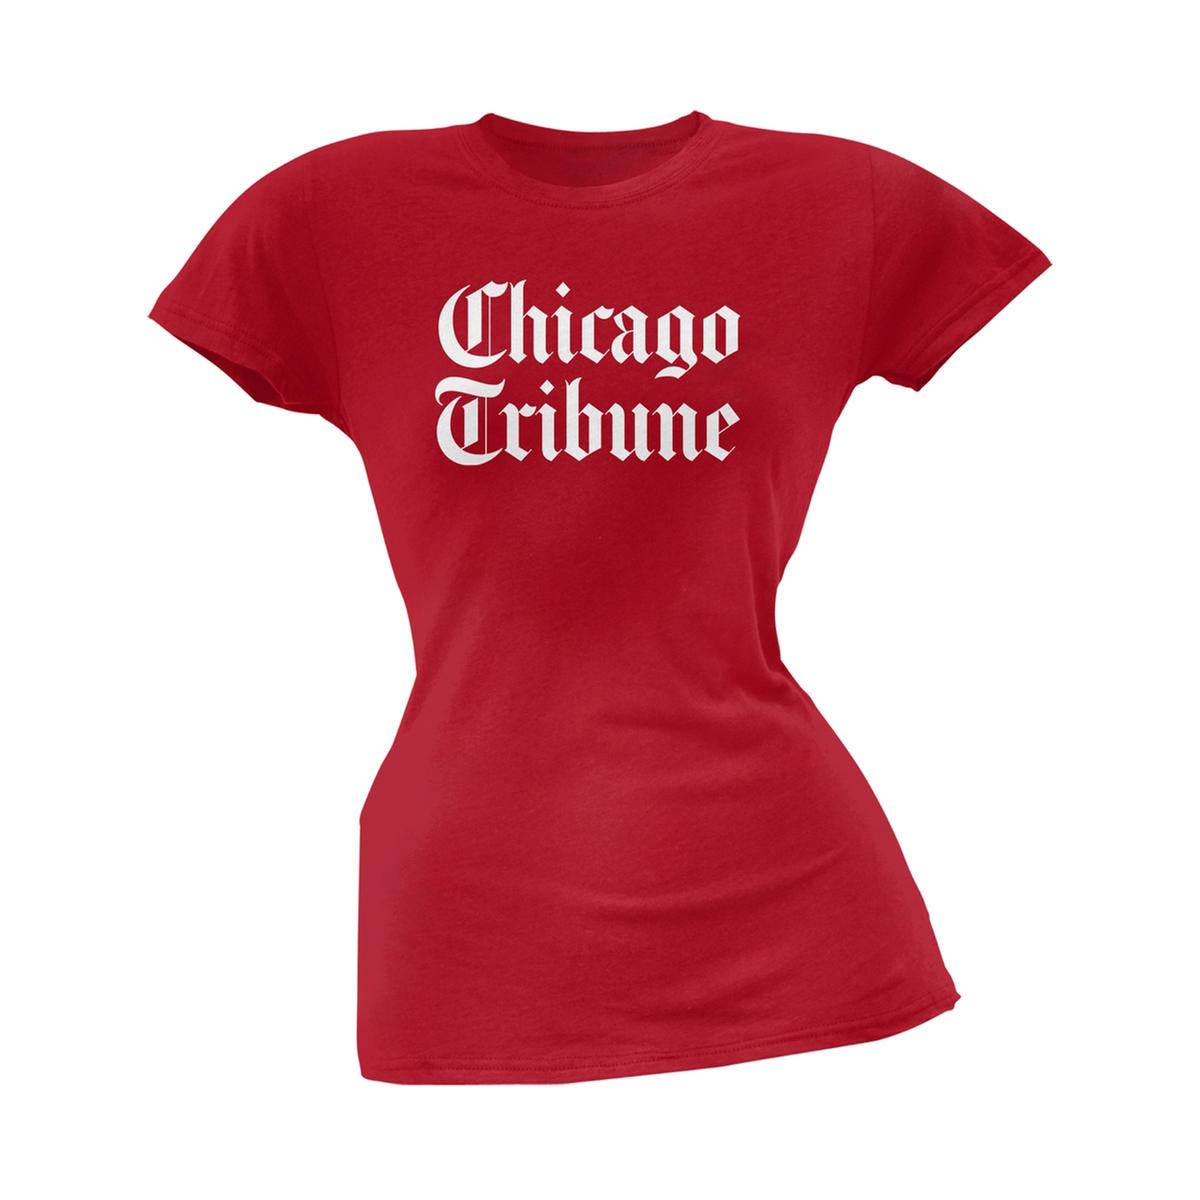 Chicago Tribune Women's Red T-Shirt